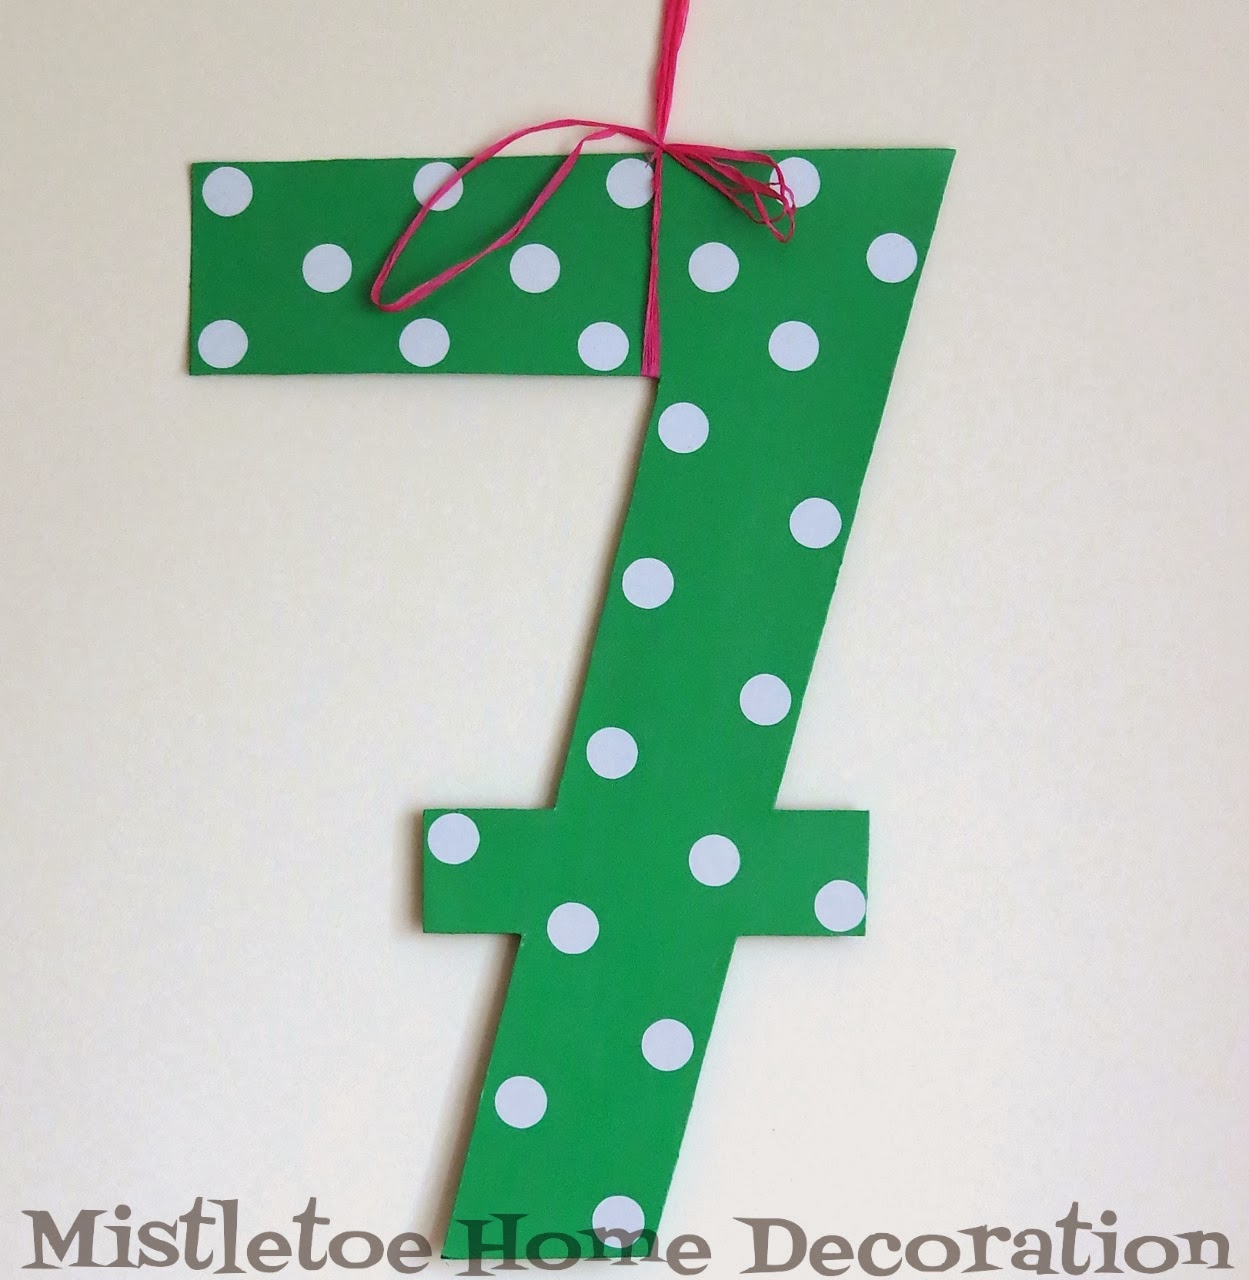 Mistletoe Home Polka Dot Number Sign For Birthday Party